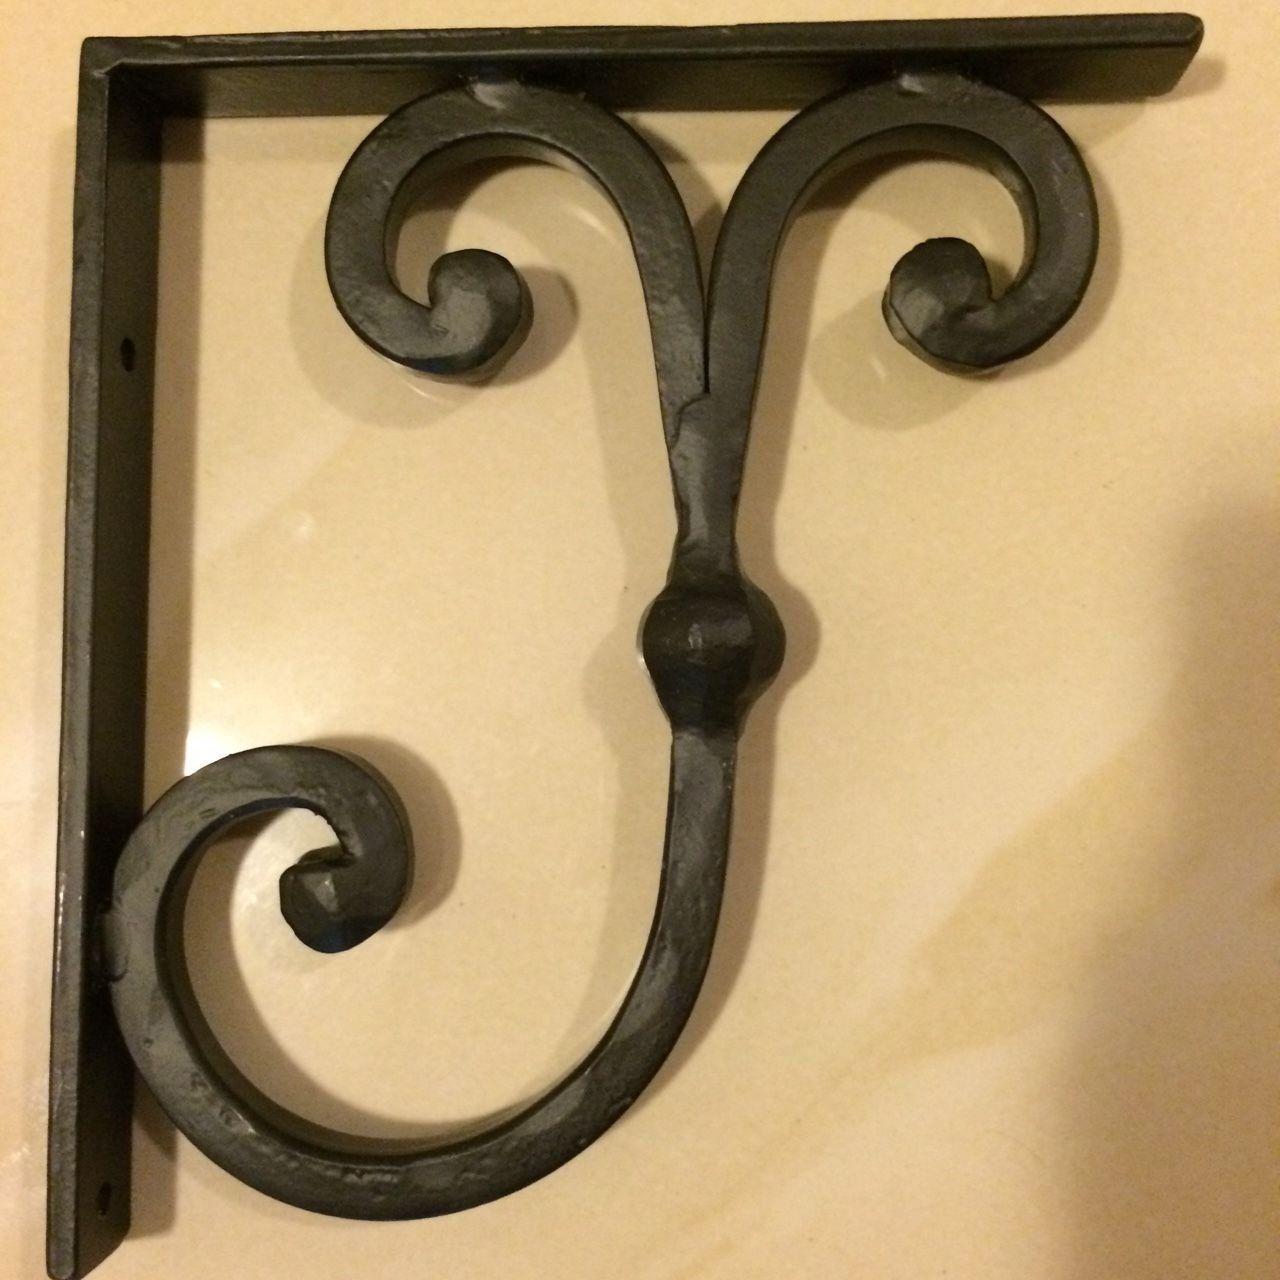 Wrought Iron Granite Countertop Corbel and Decorative Shelf Bracket ...